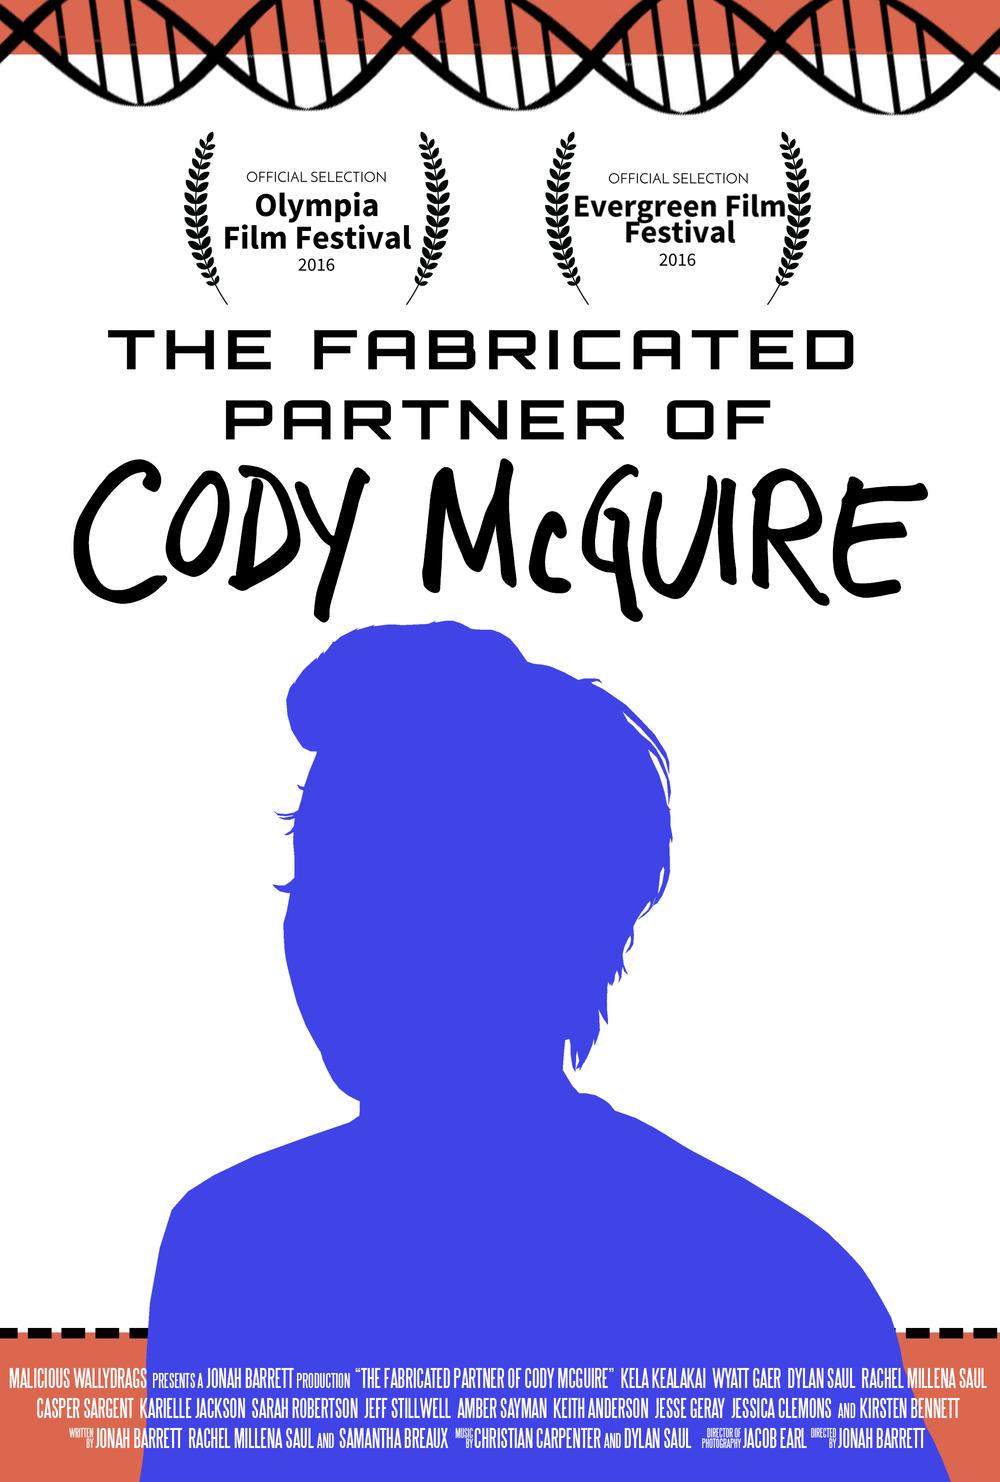 CodyMcGuirePoster 2.png